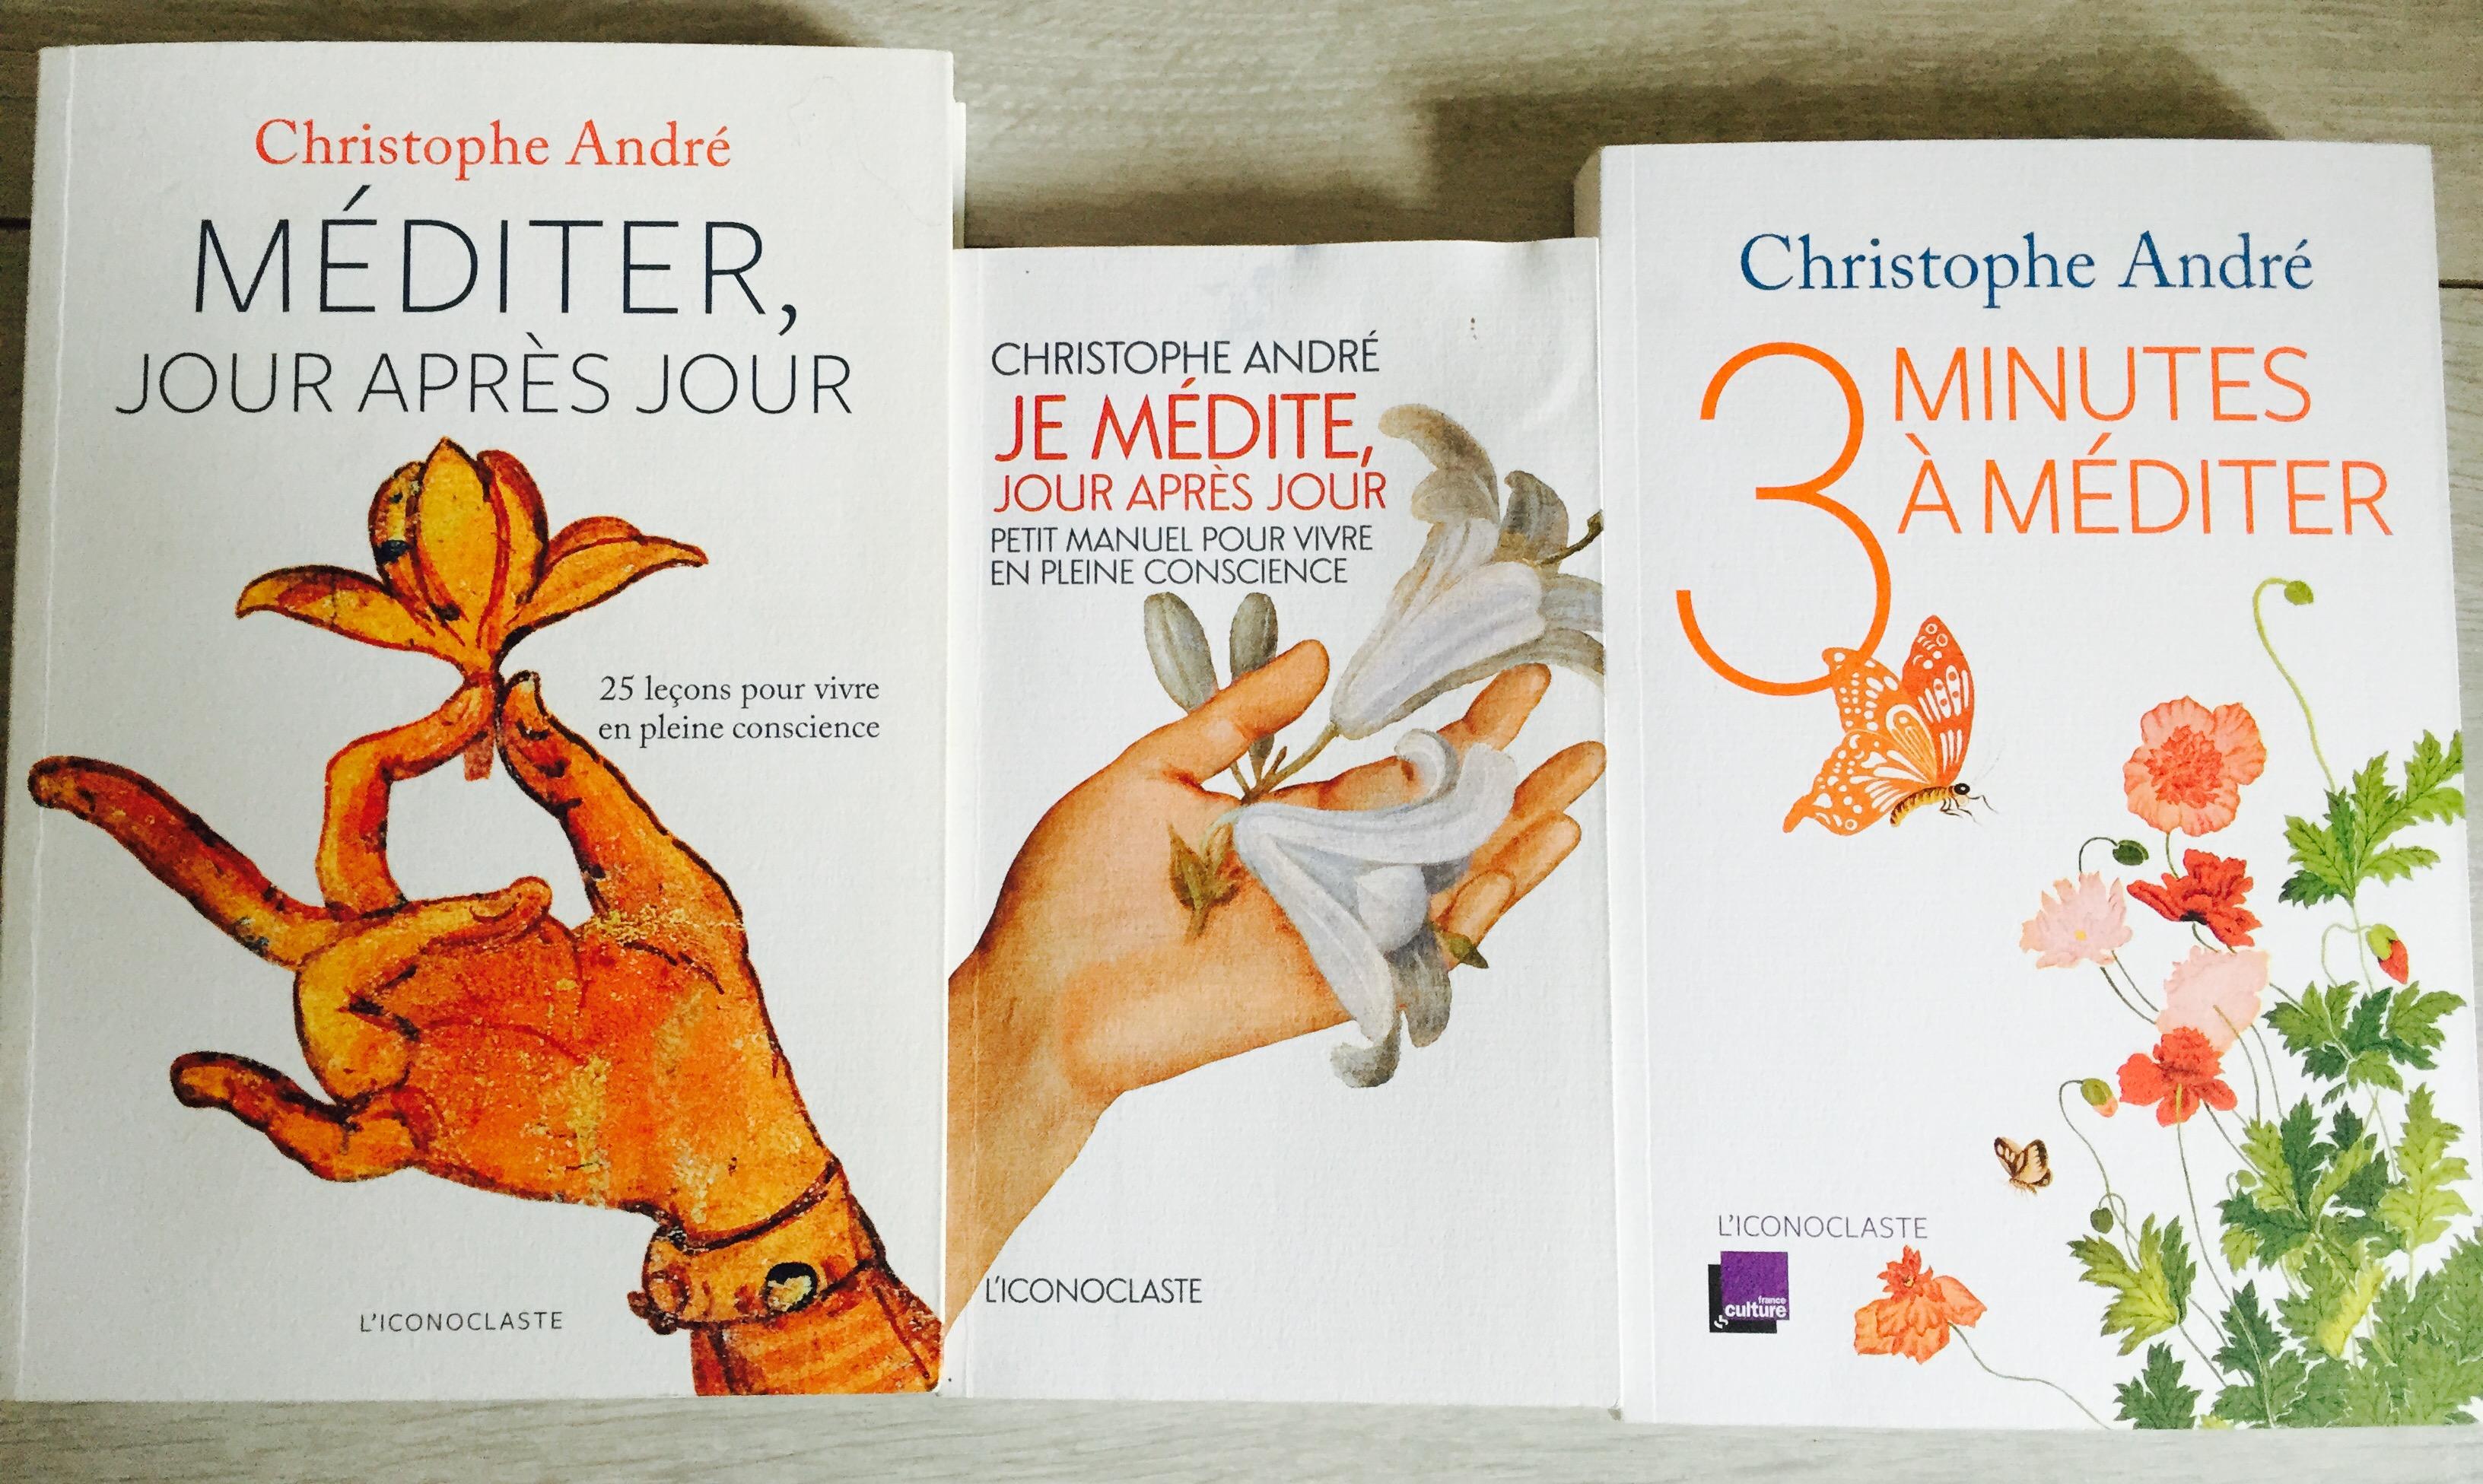 Méditer avec Christophe André